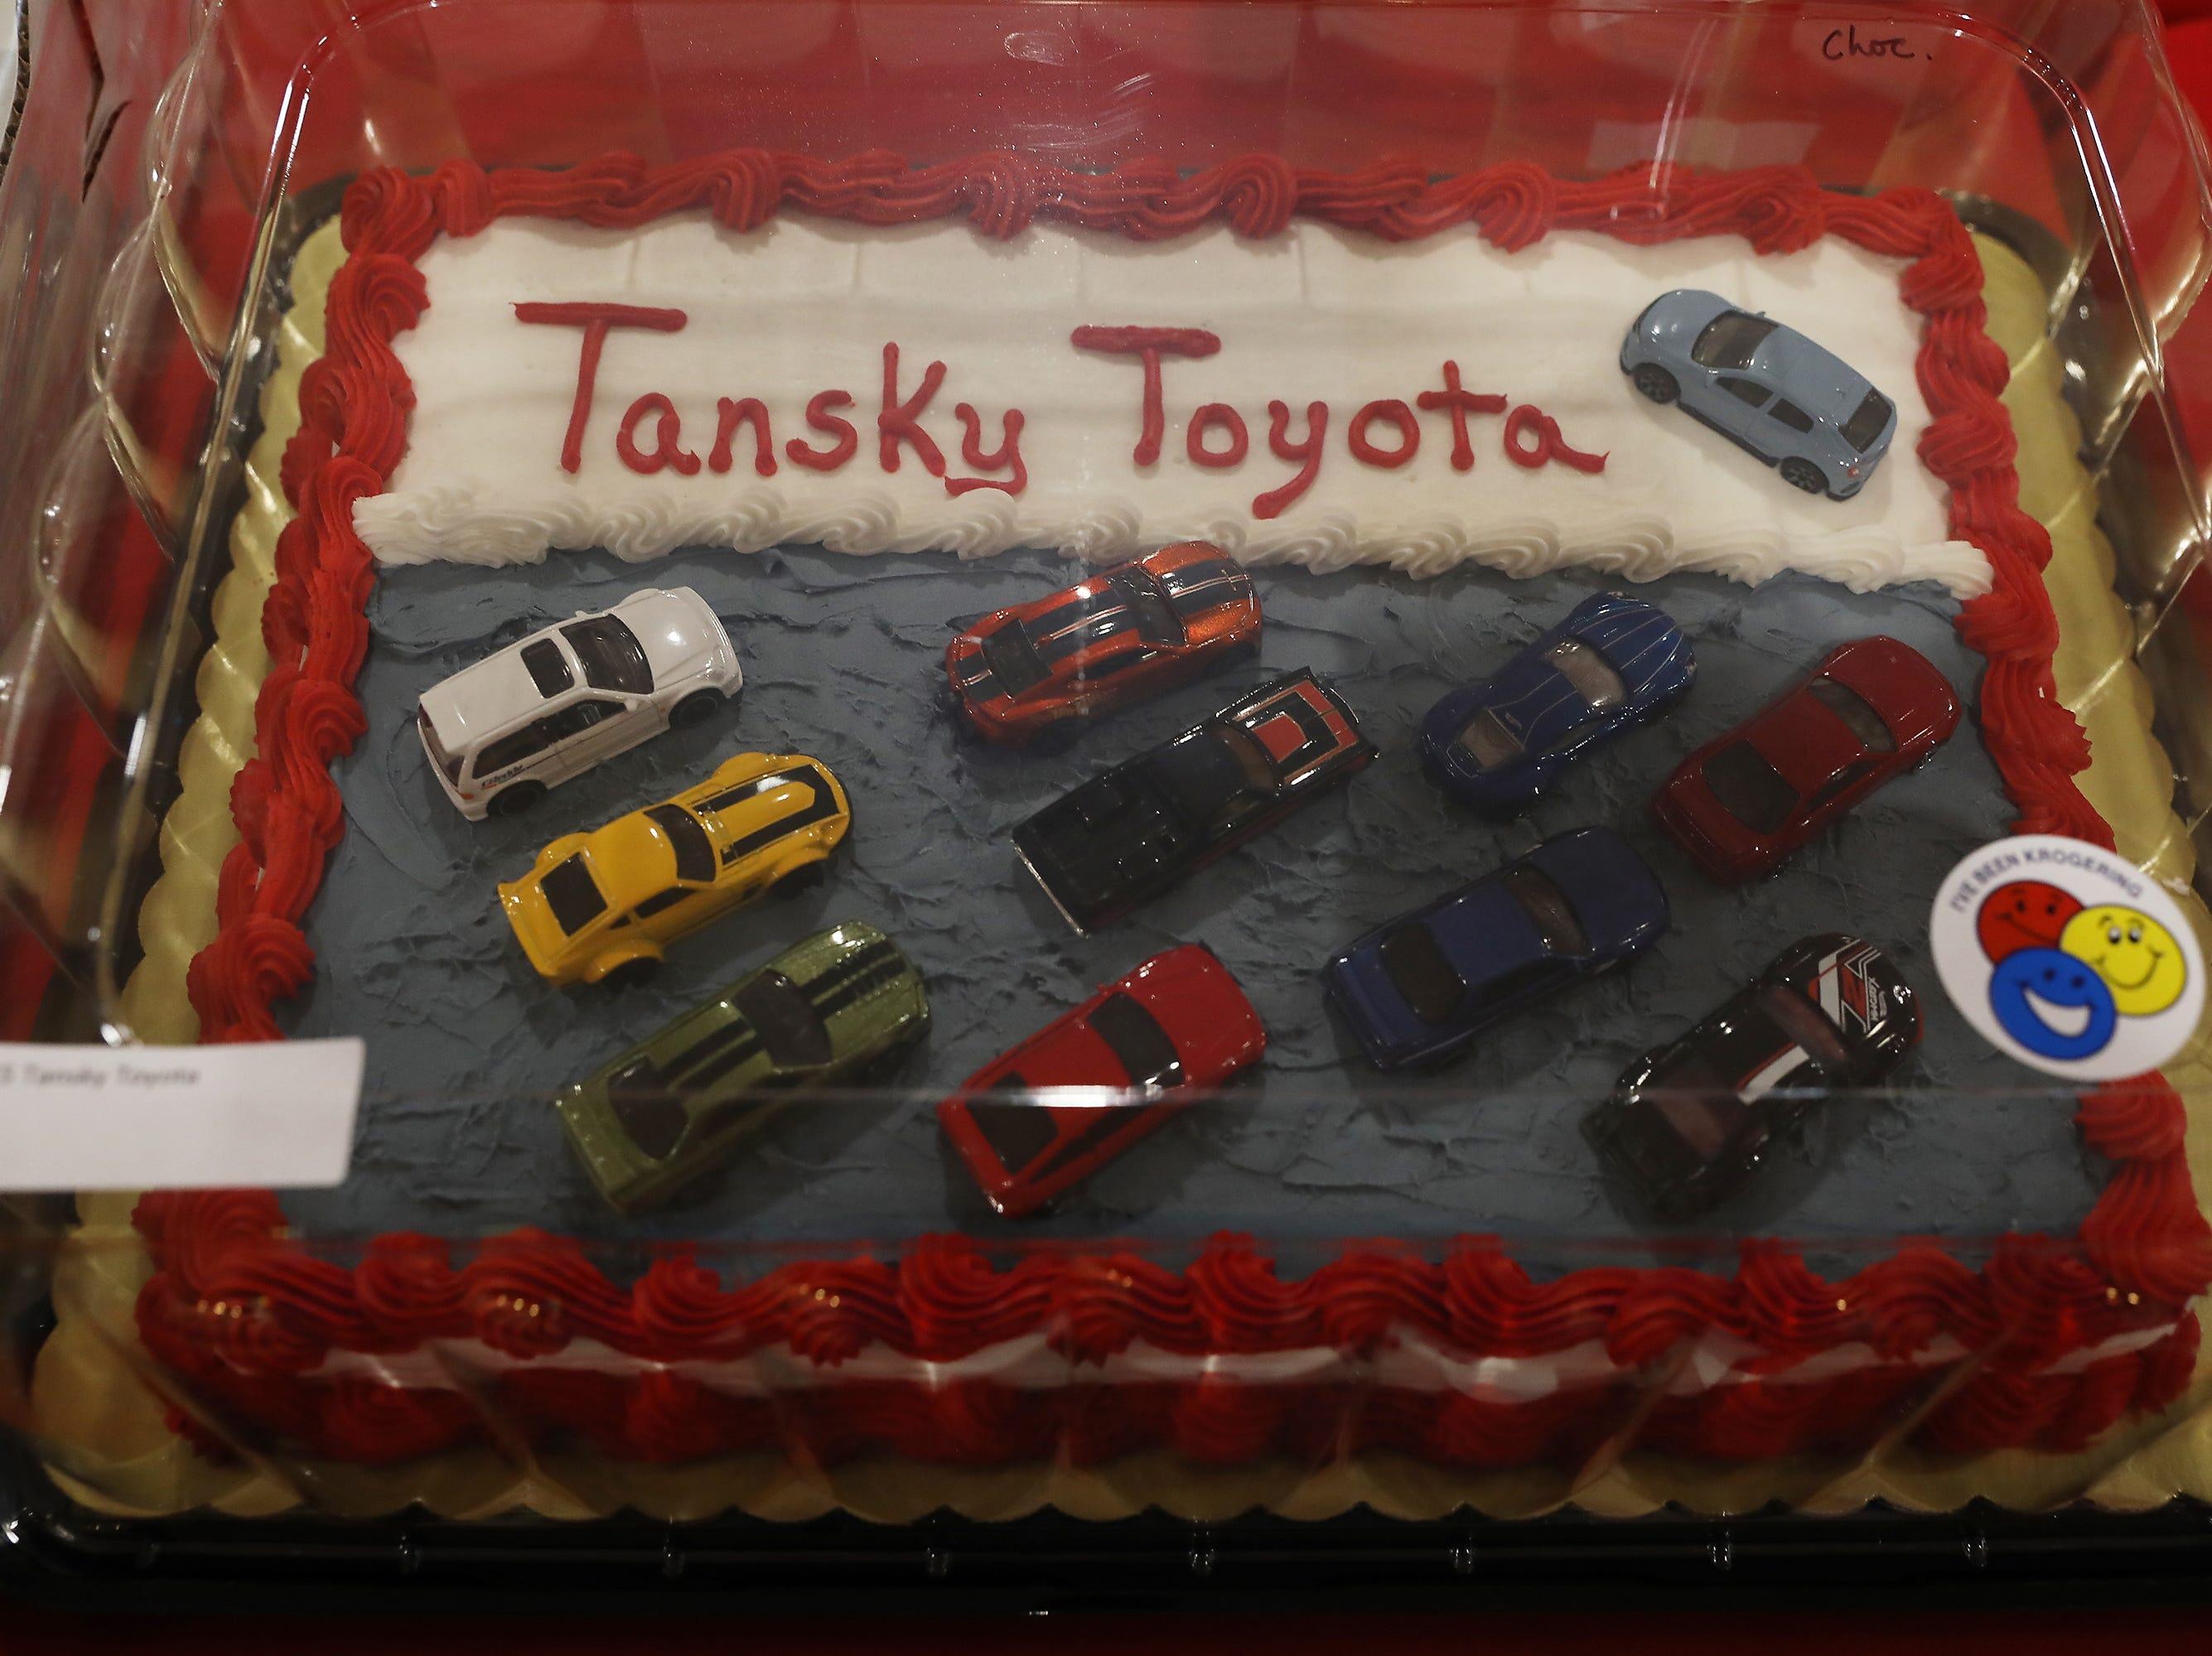 1:45 P.M. Thursday cake 115 Tansky Toyota - $100 to local restaurants